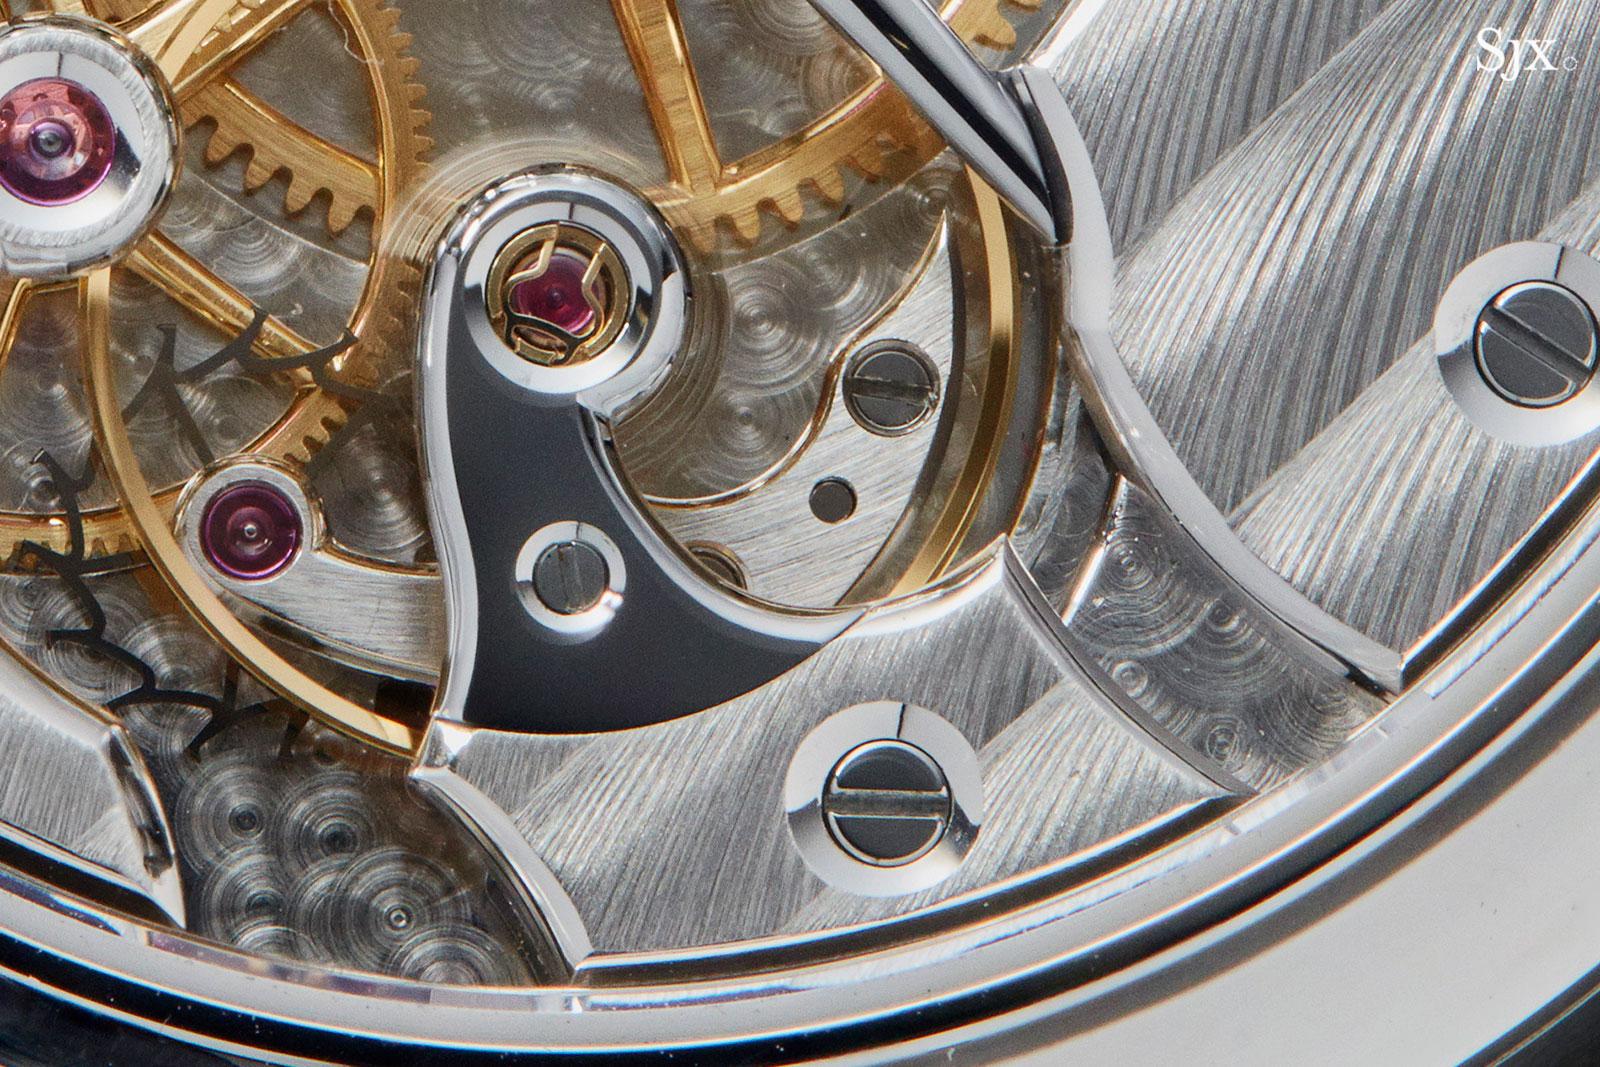 Akrivia Chronometre Contemporain Rexhep Rexhepi 6